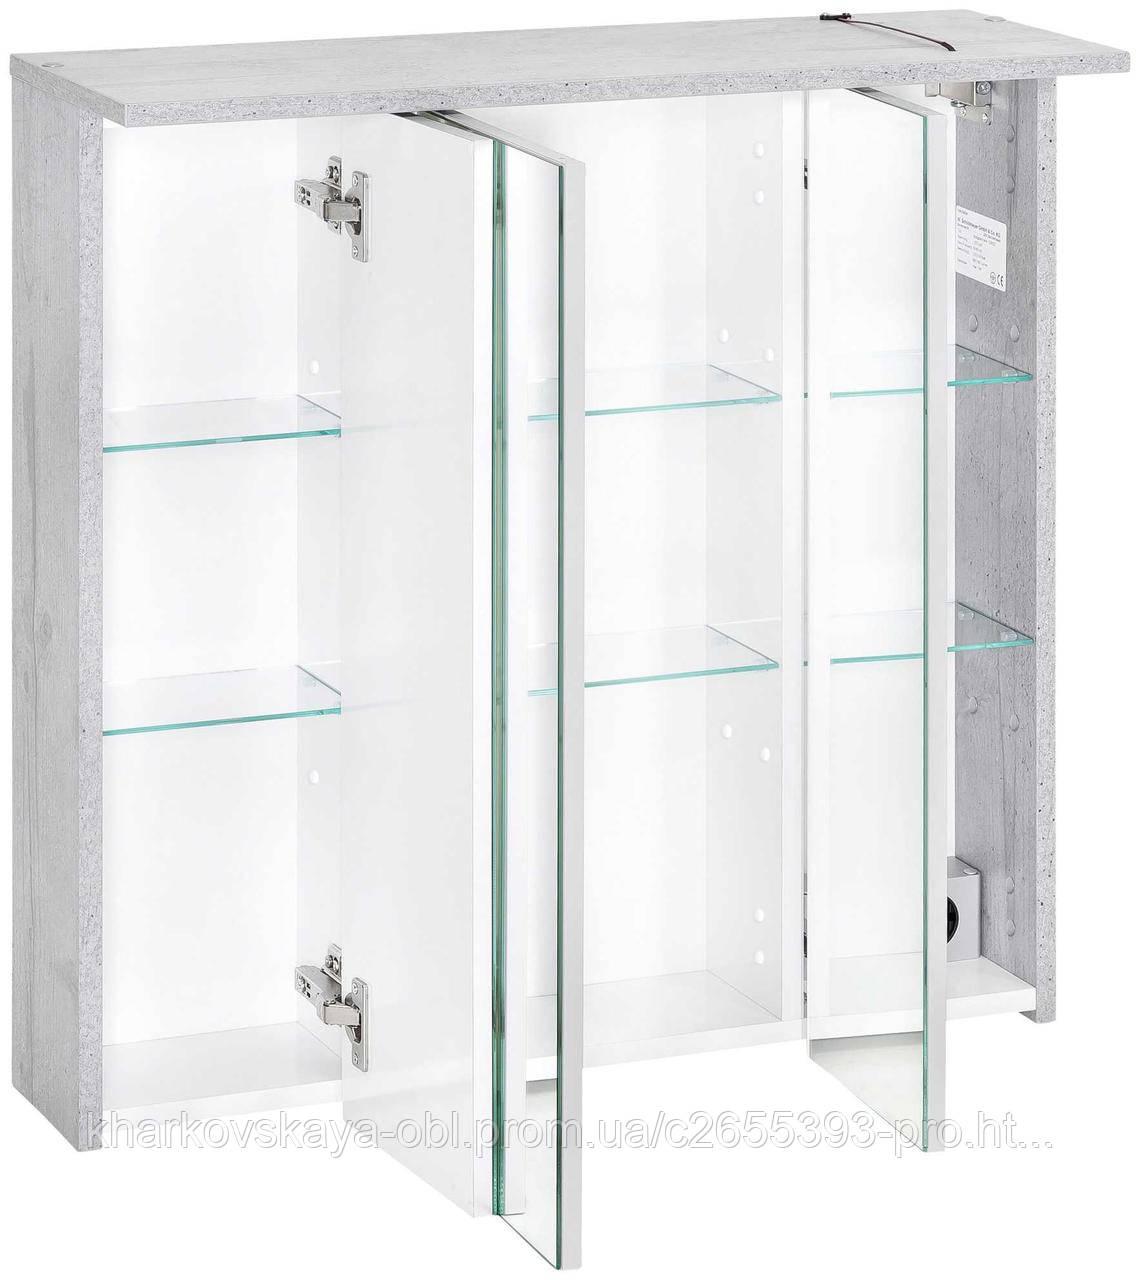 Настенный зеркальный 3D шкаф для ванной комнаты. Германия.